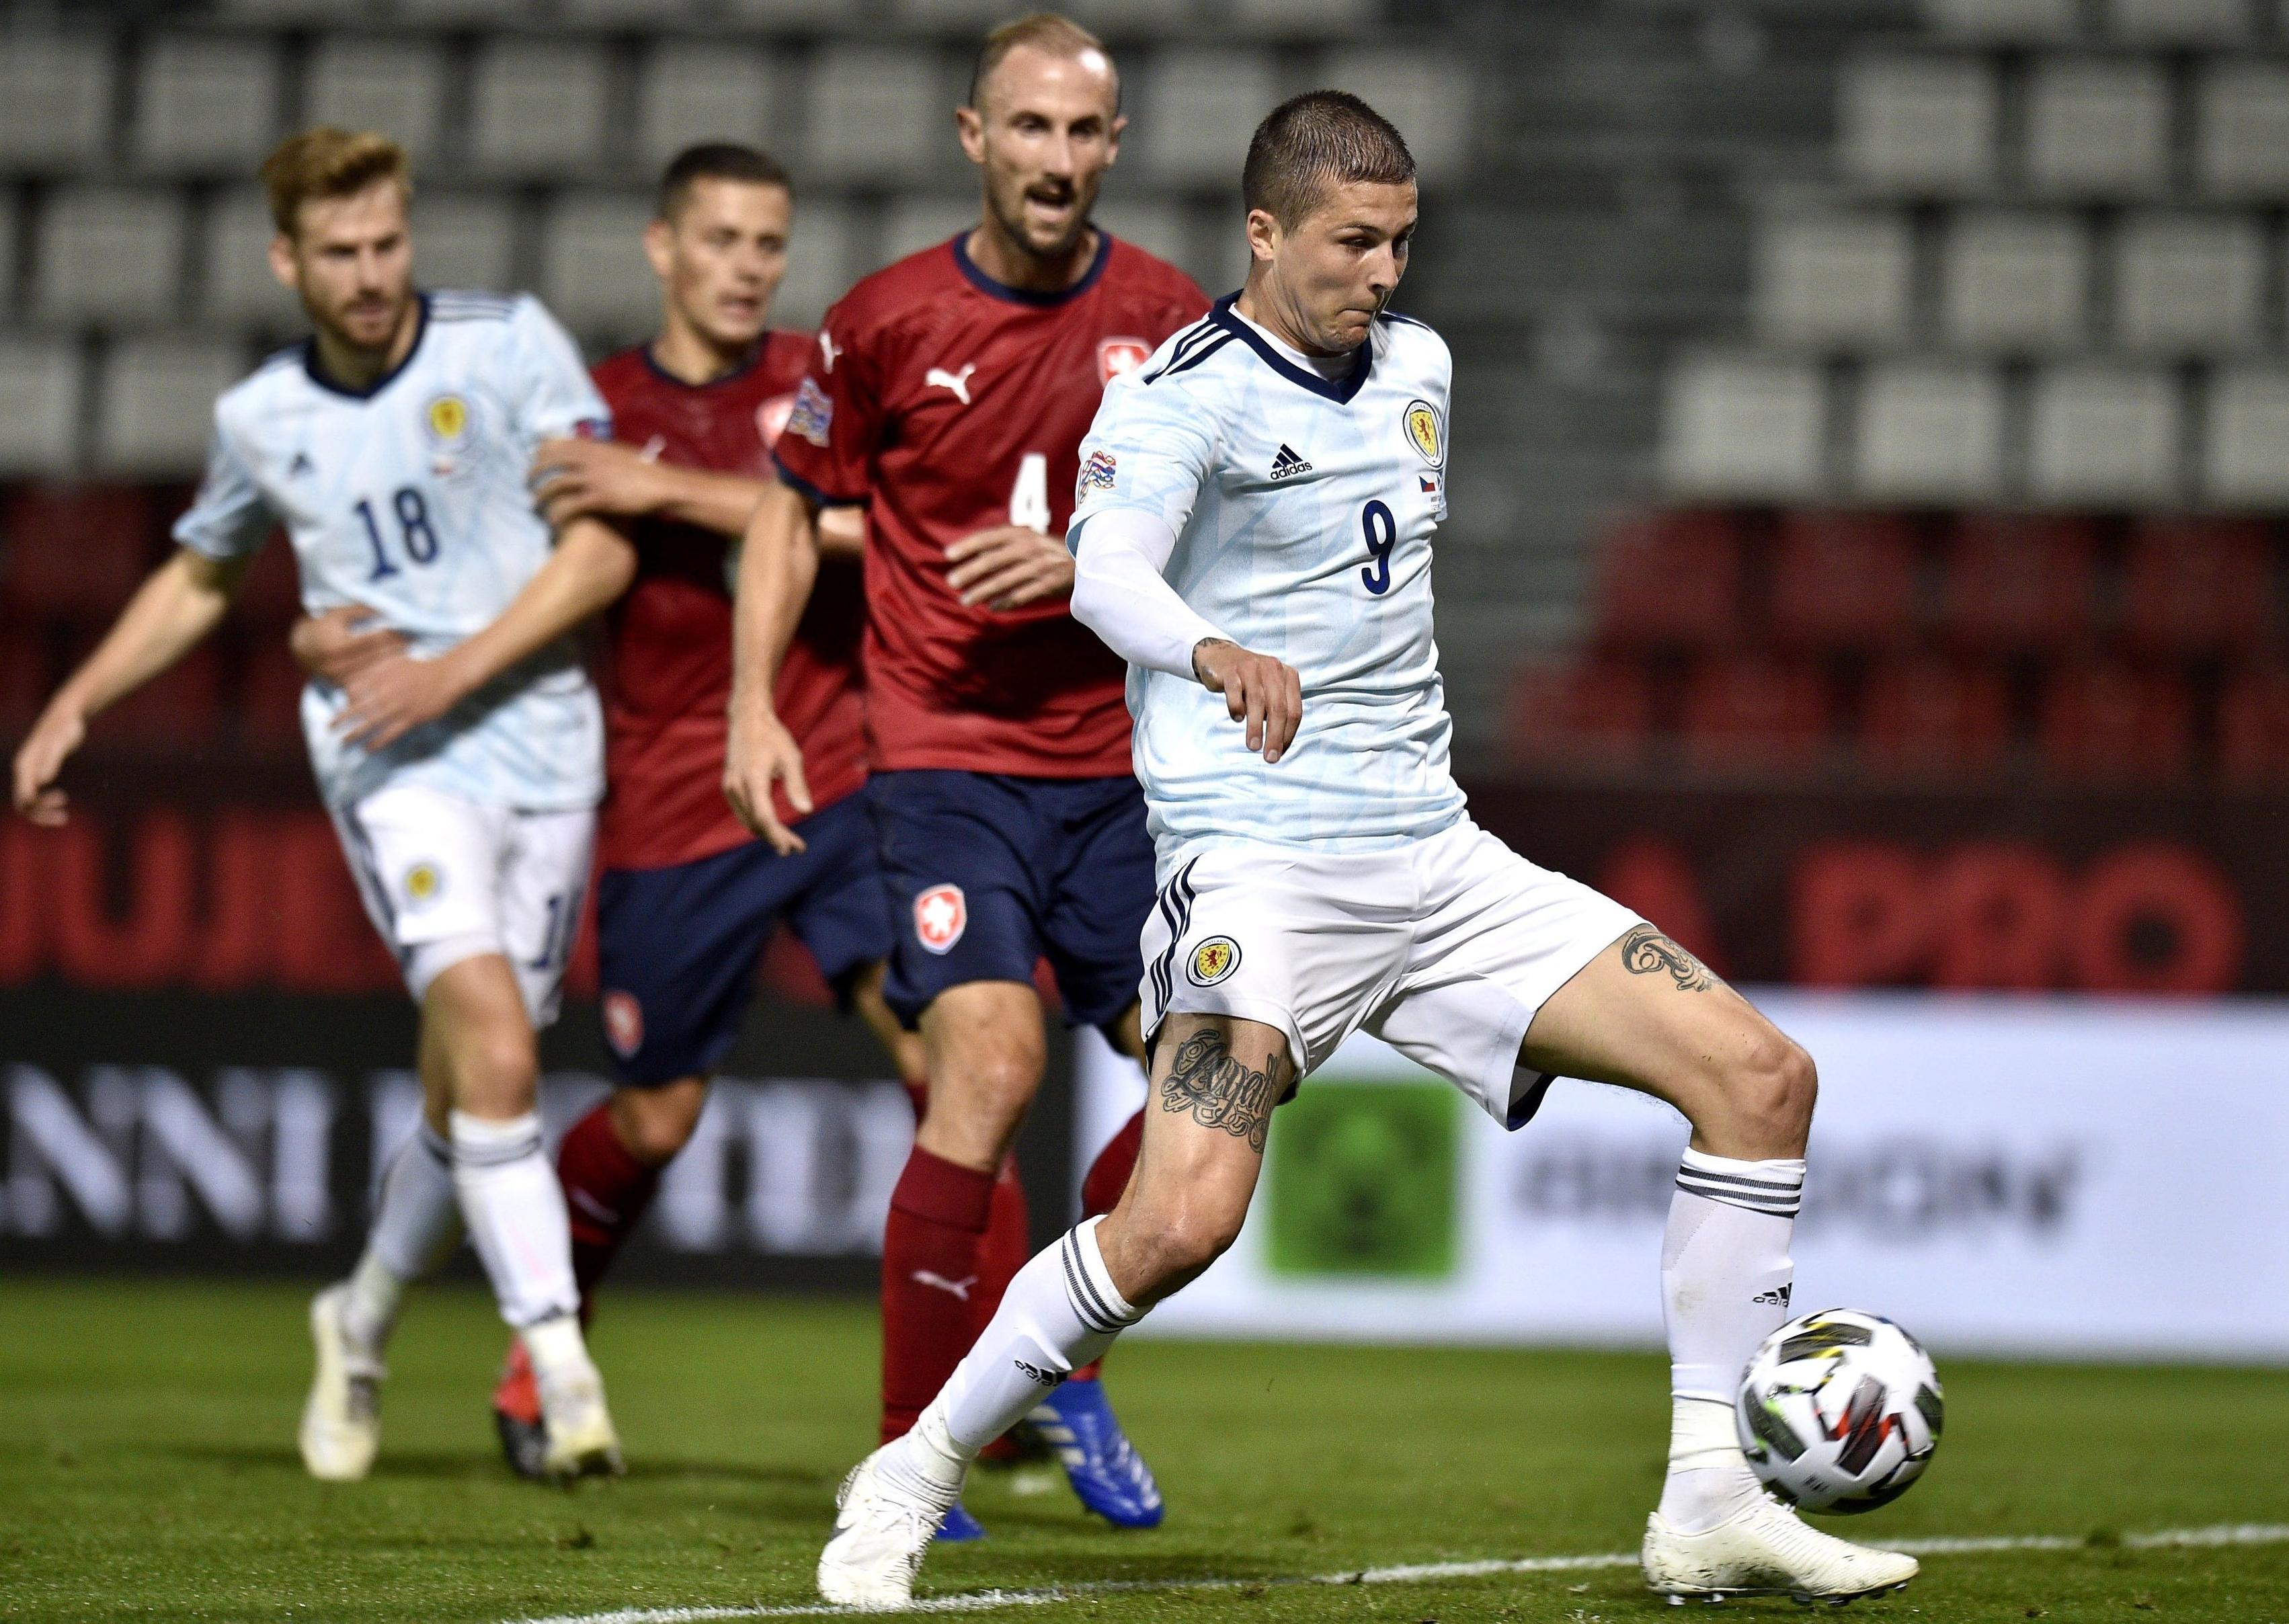 Czech Republic 1-2 Scotland: Ryan Christie penalty seals victory   The  Scotsman